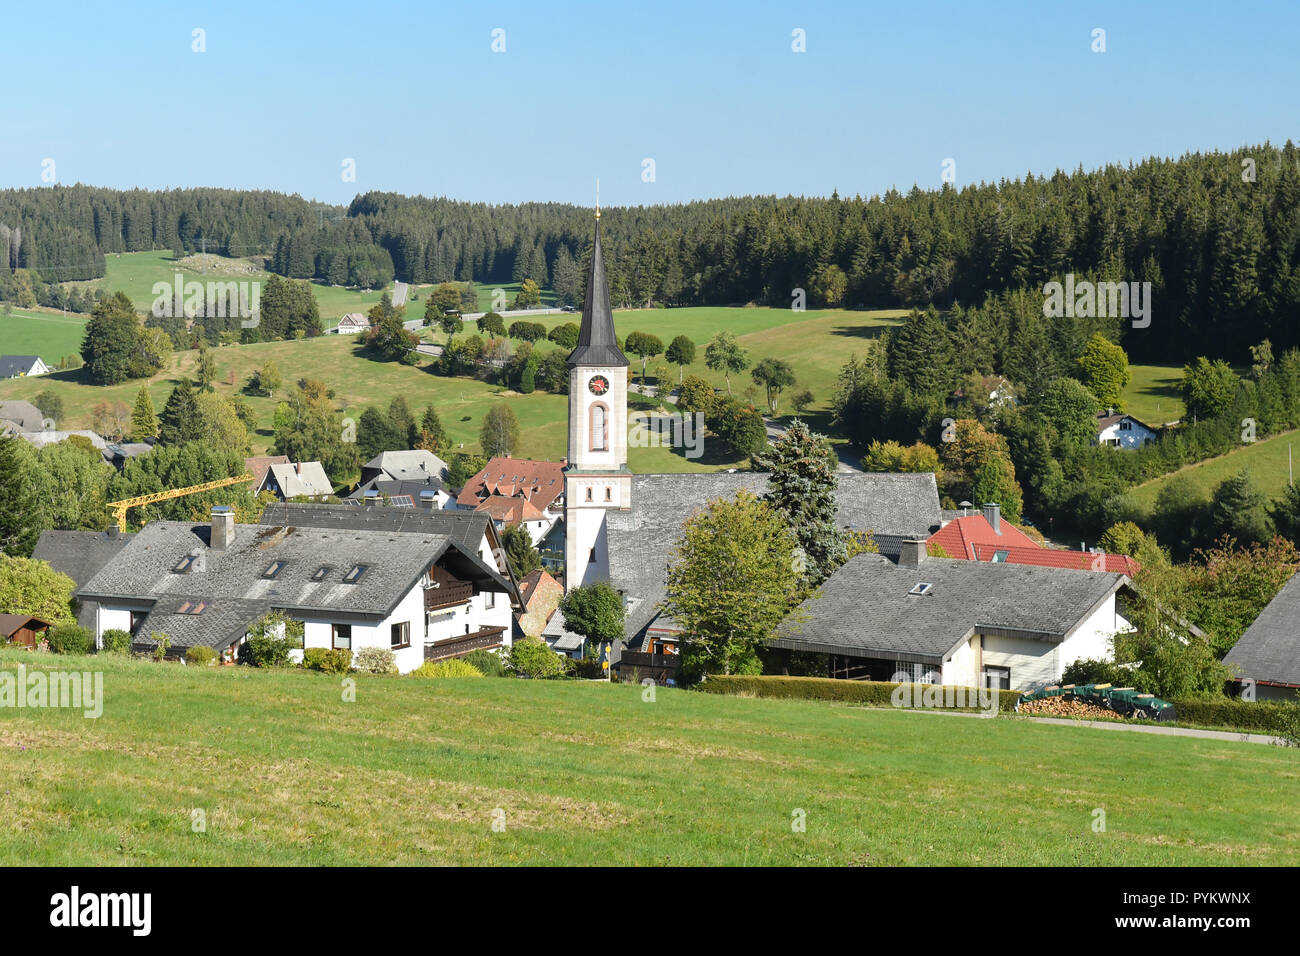 Schonwald im Schwarzwald, Baden-Wurttemberg, Germany, Europe - black forest village and birthplace of Franz Ketterer, German clockmaker - Stock Image